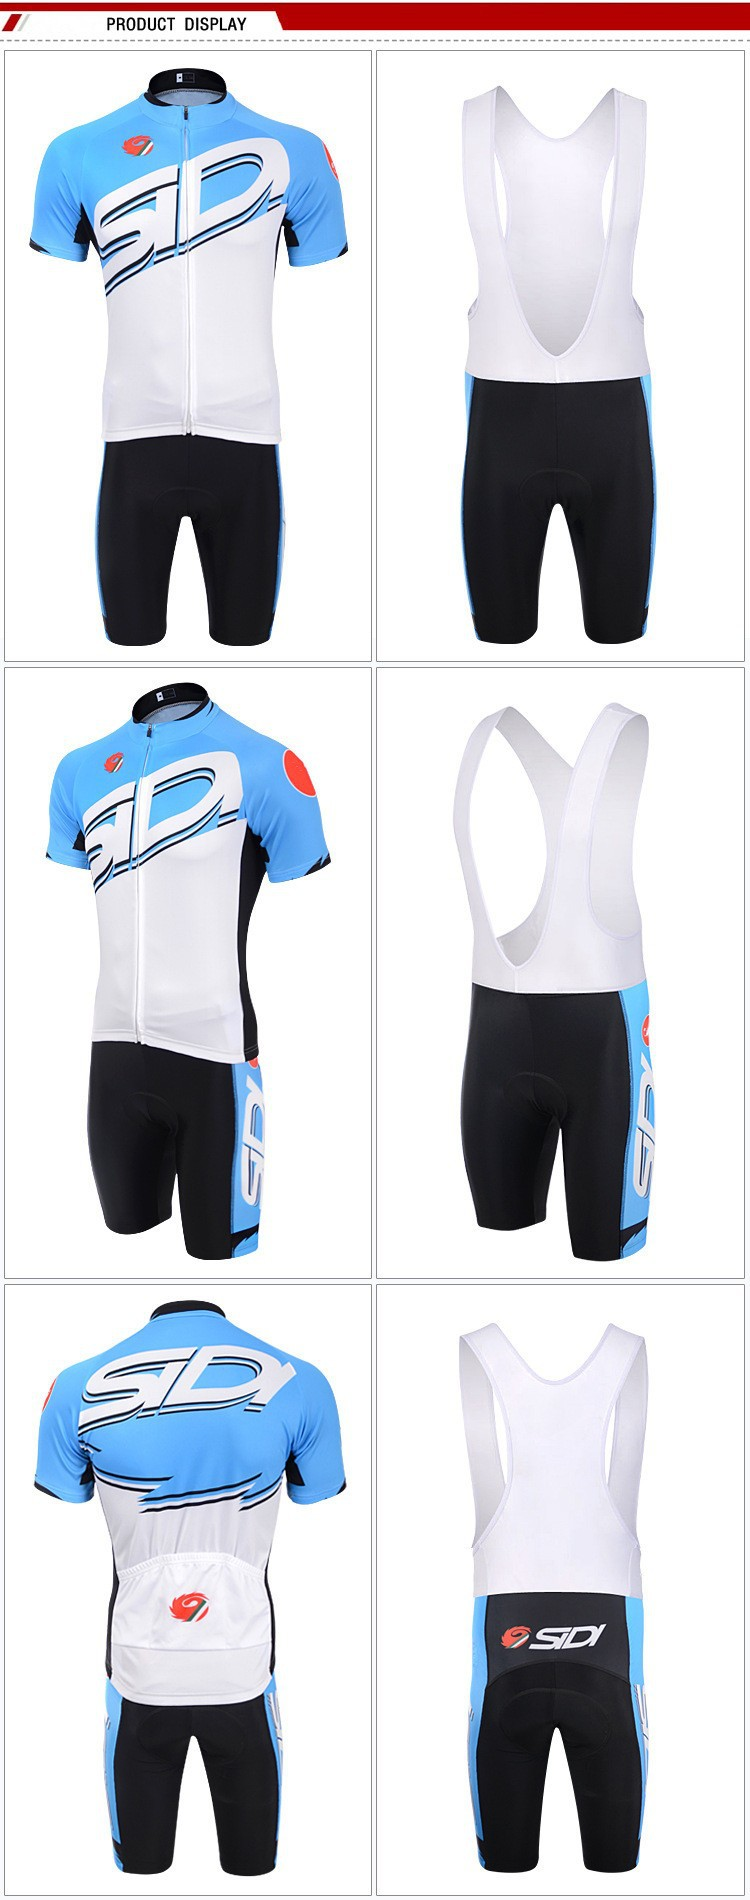 2015 New SIDI Sports wear Mountain Bike Ropa Ciclismo Bicycle Wear Cycling  Jersey clothing Shirt+Bib Shorts sets mtb Jerseys 7870f0104